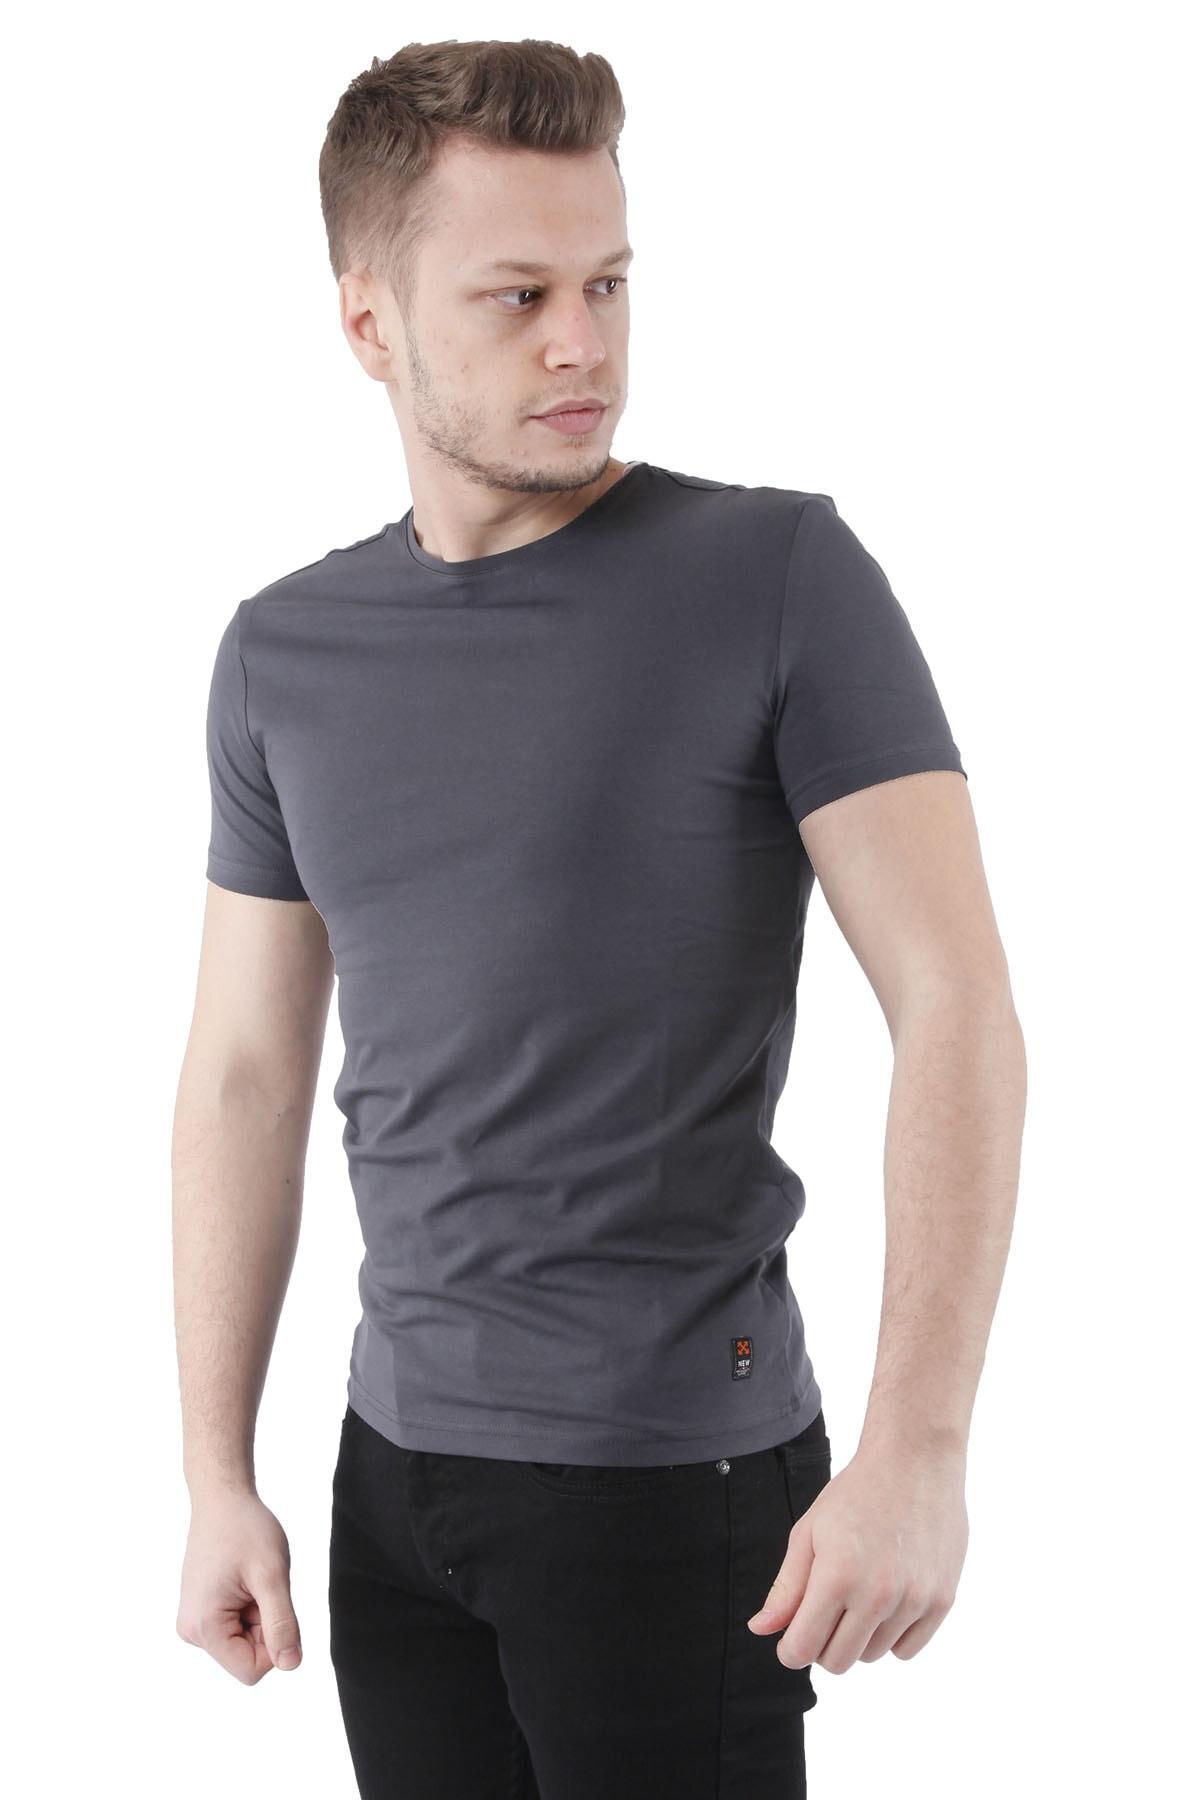 Canelia Antrasit Erkek Slimfit T-shirt 2